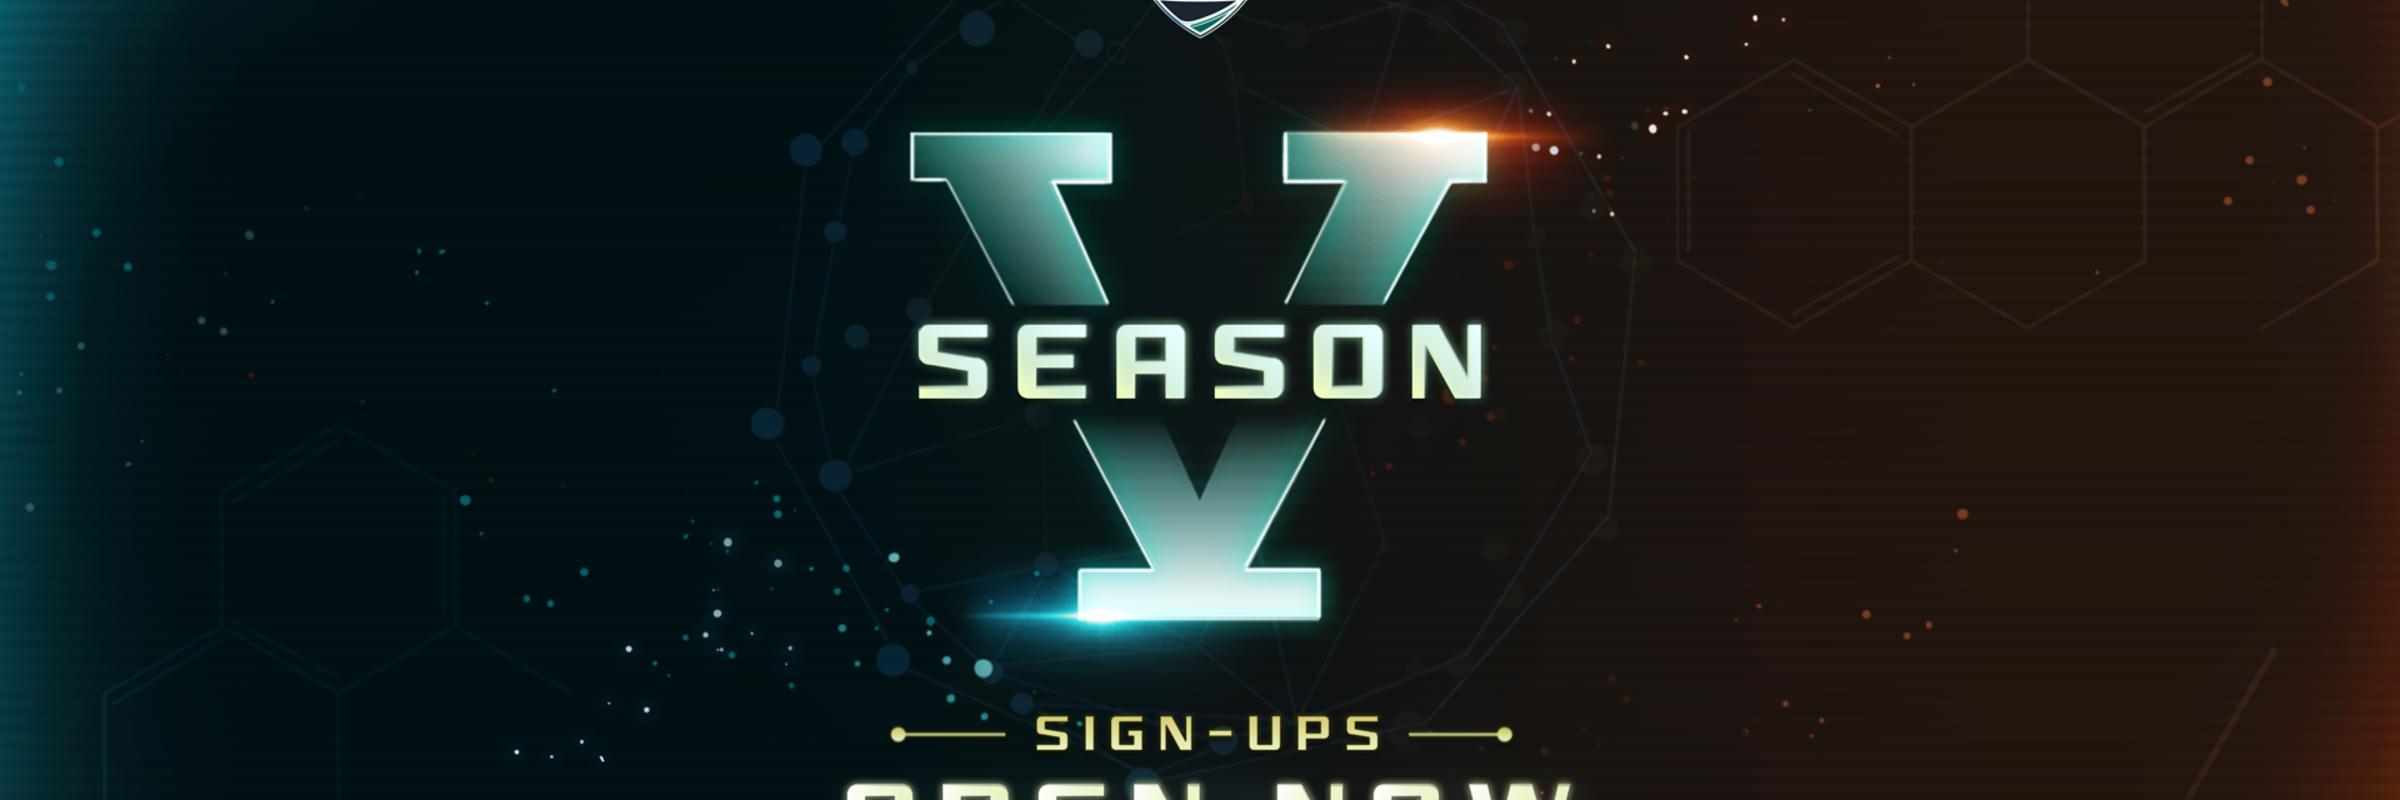 RLCS Season 5 Sign-Ups Open Now Image